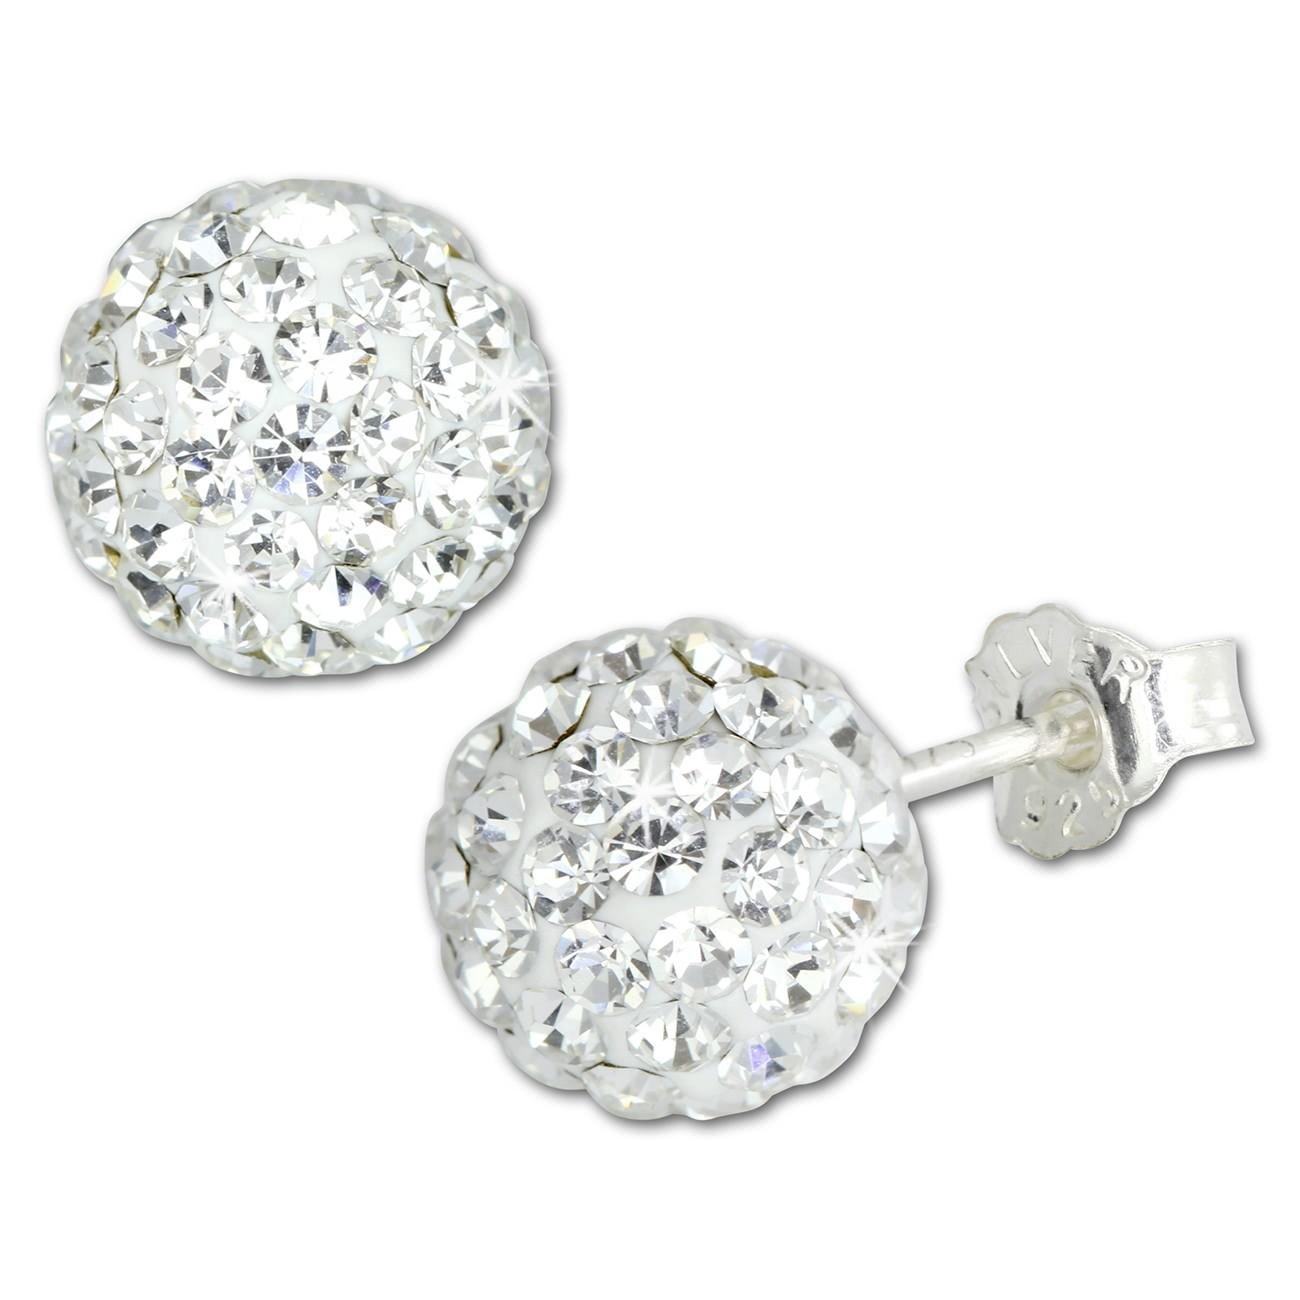 SilberDream Ohrstecker Glitzerkugel 8mm weiß 925 Silber Ohrring GSO2808W